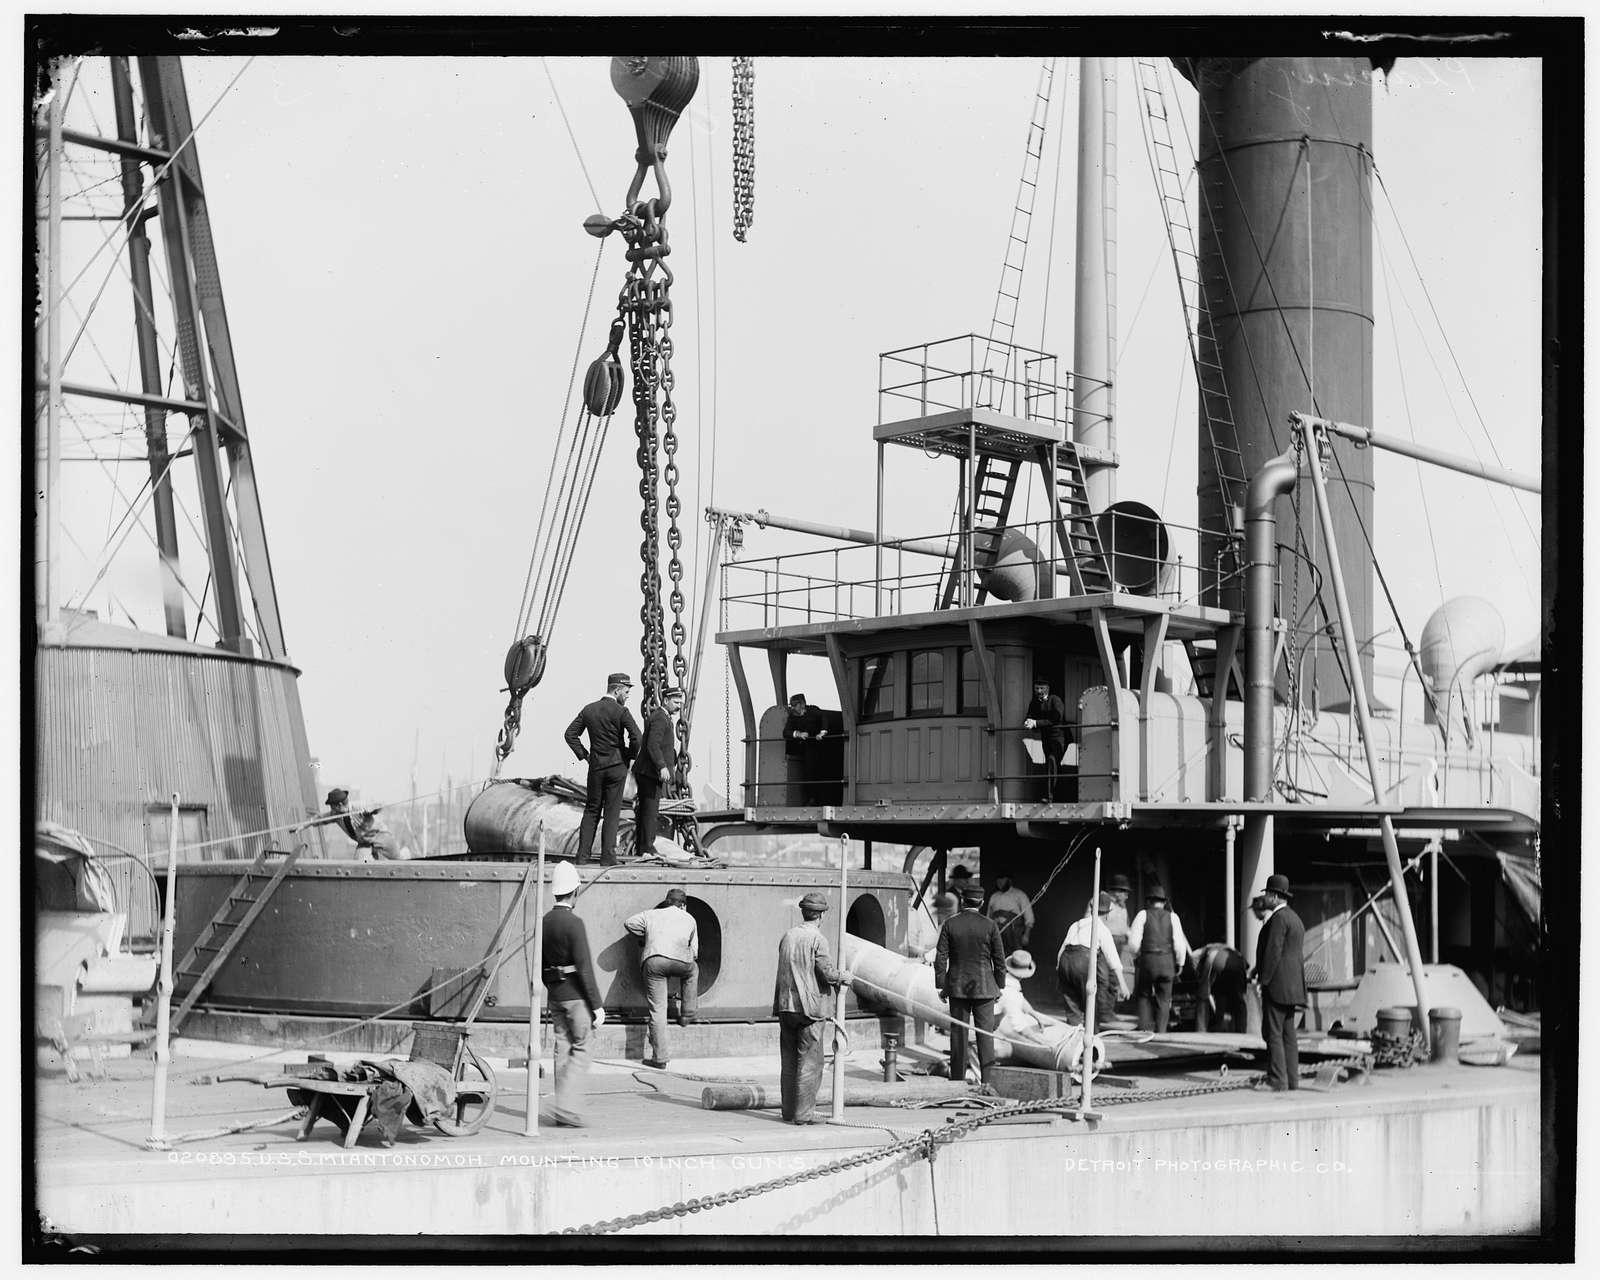 U.S.S. Miantonomoh, mounting 10-inch guns